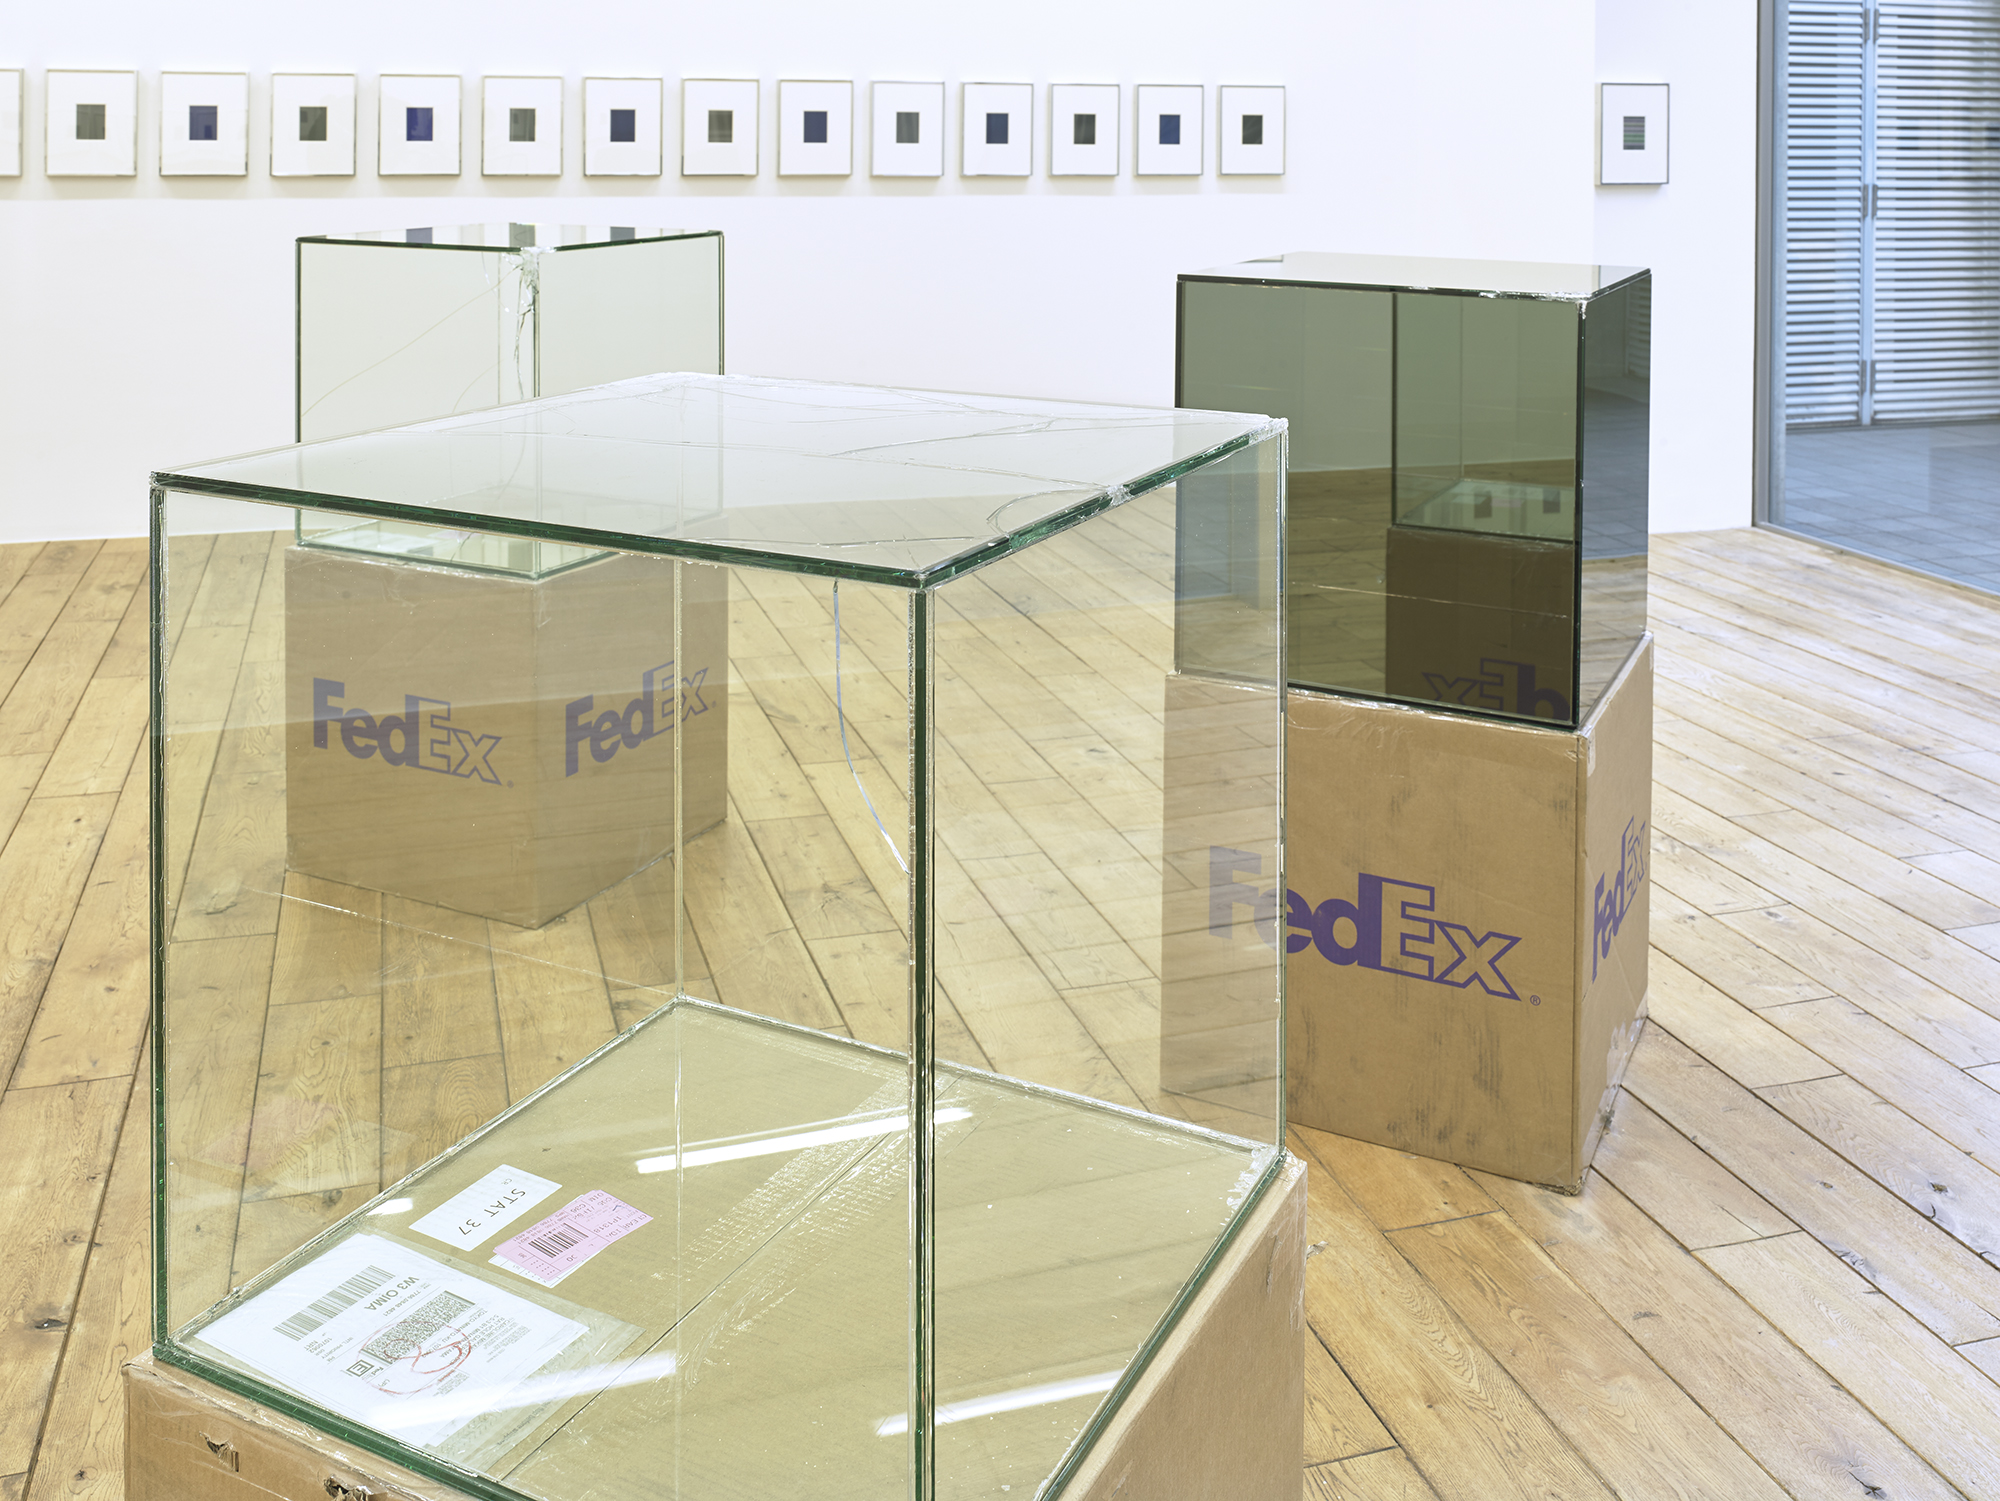 Transparencies   Rat Hole Gallery  Tokyo  Japan  2017